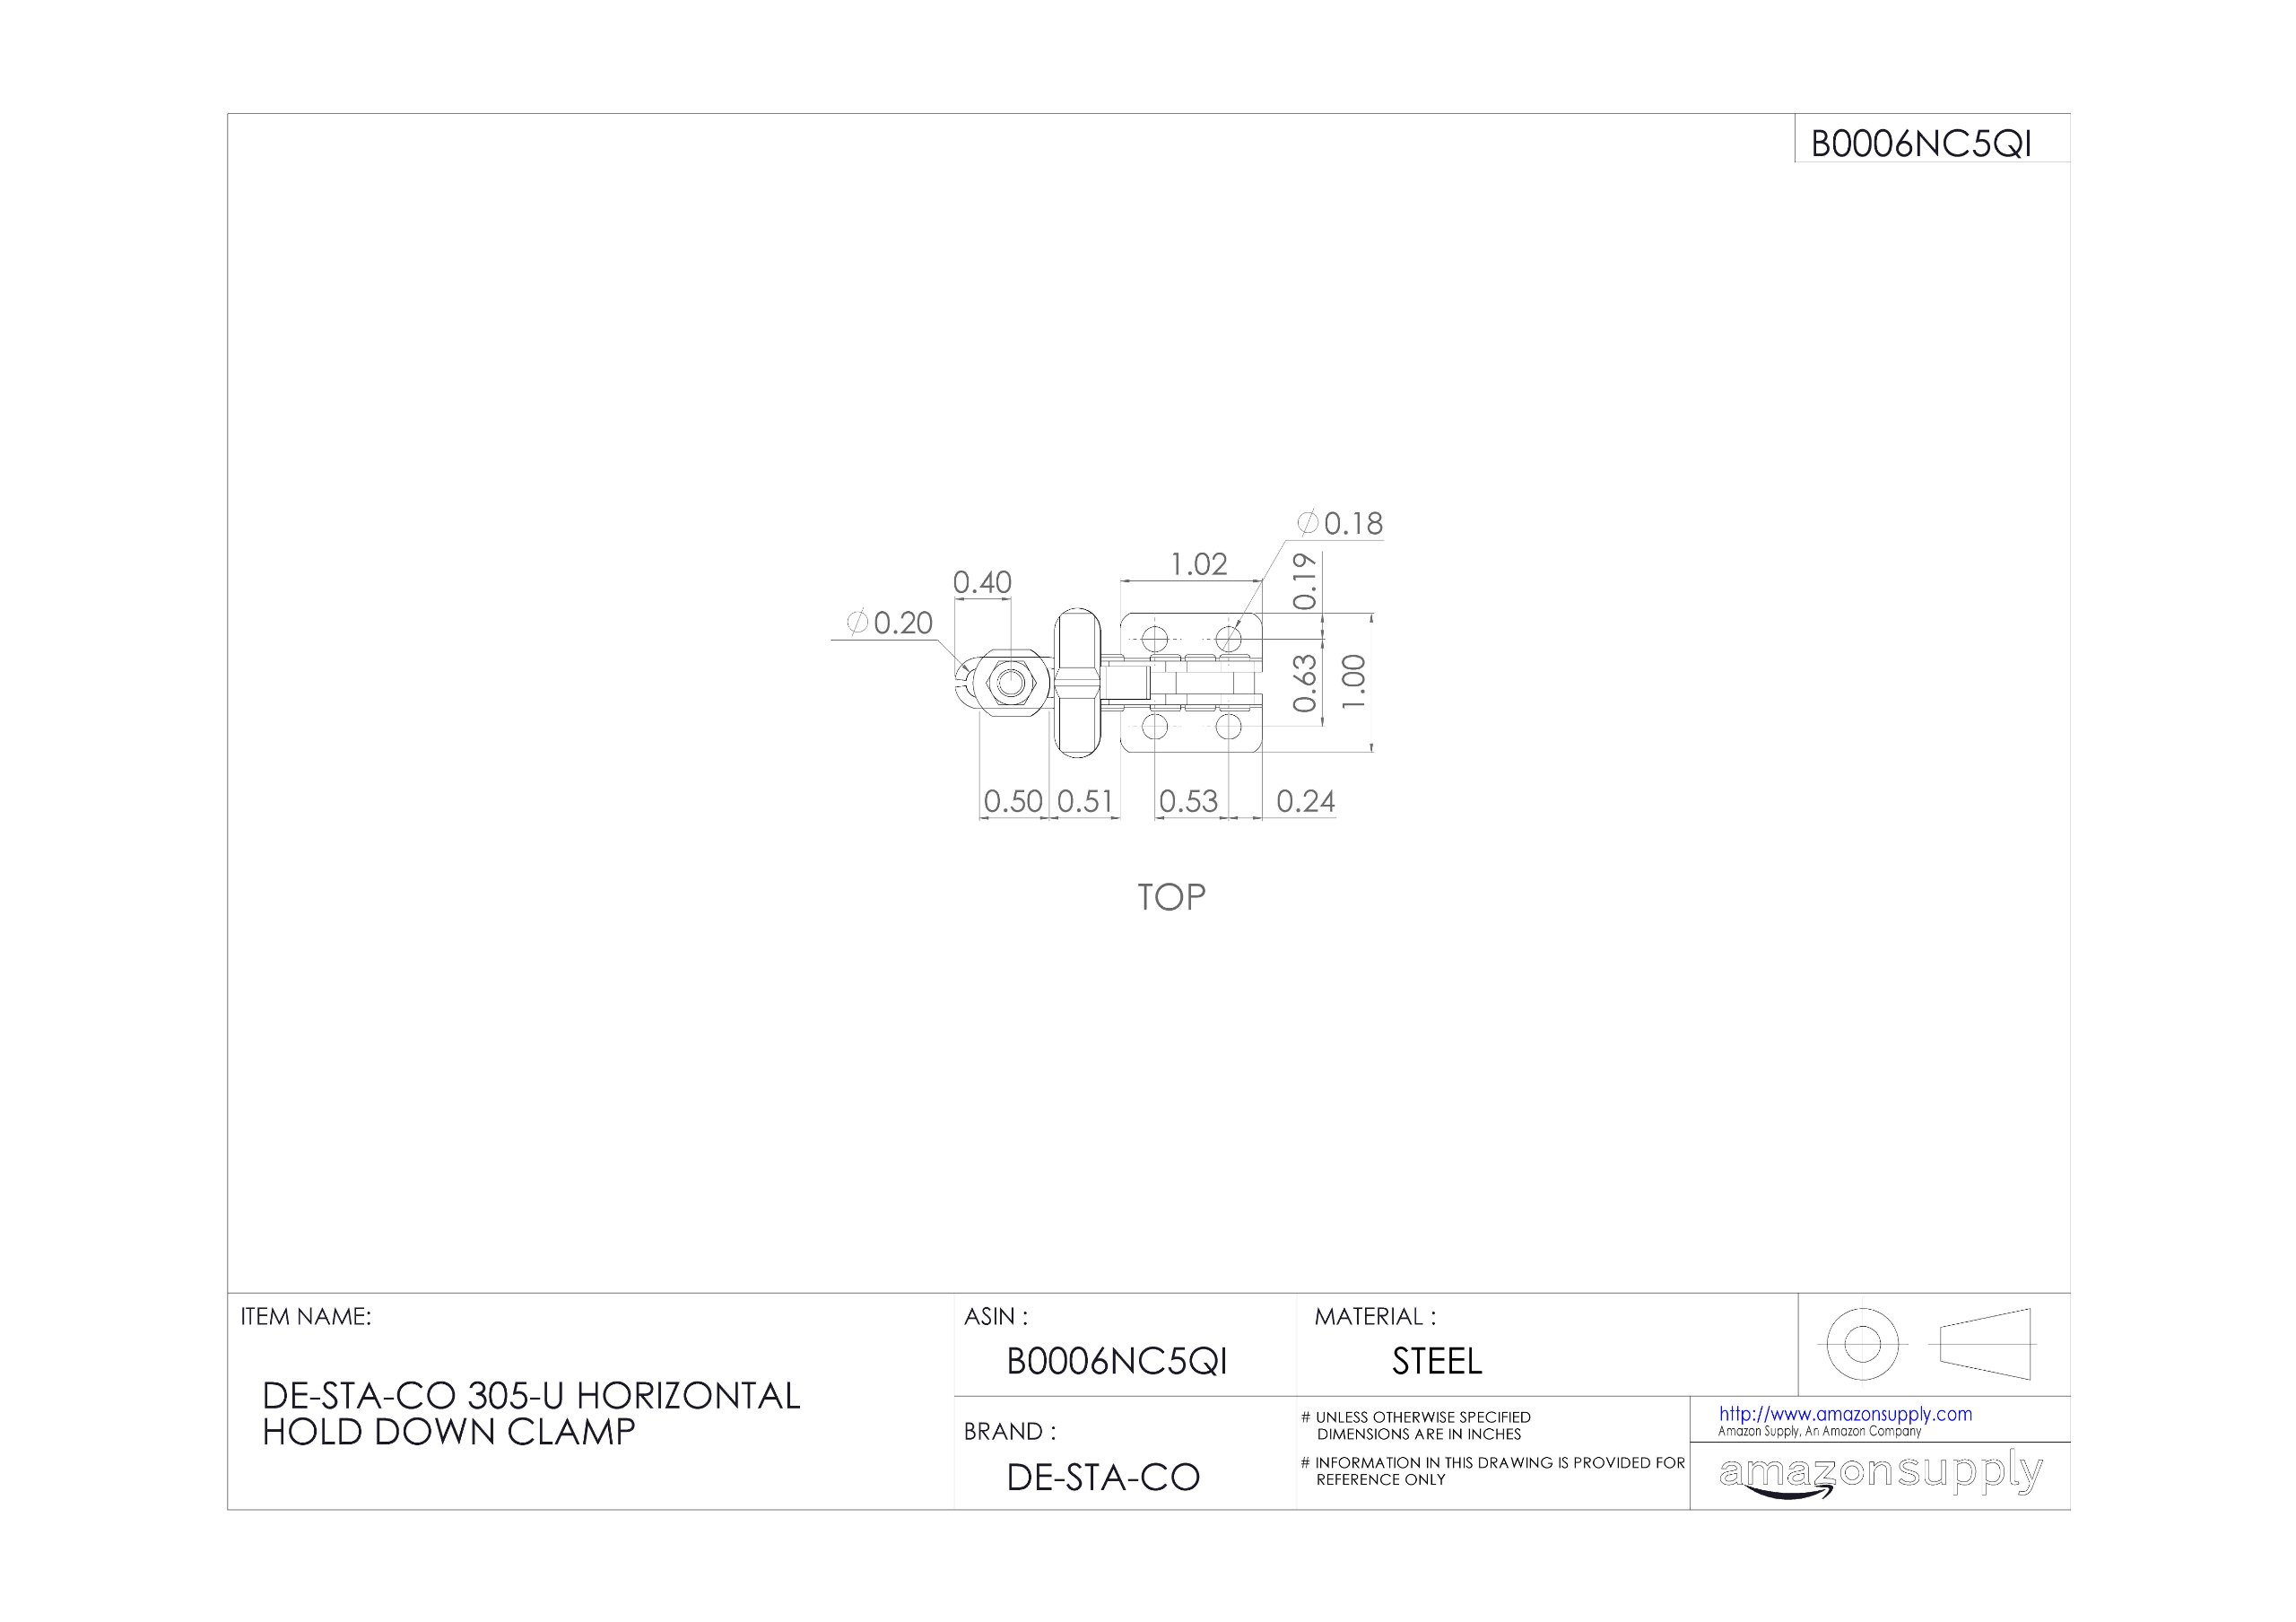 DE-STA-CO 305-U Horizontal Hold Down Clamp